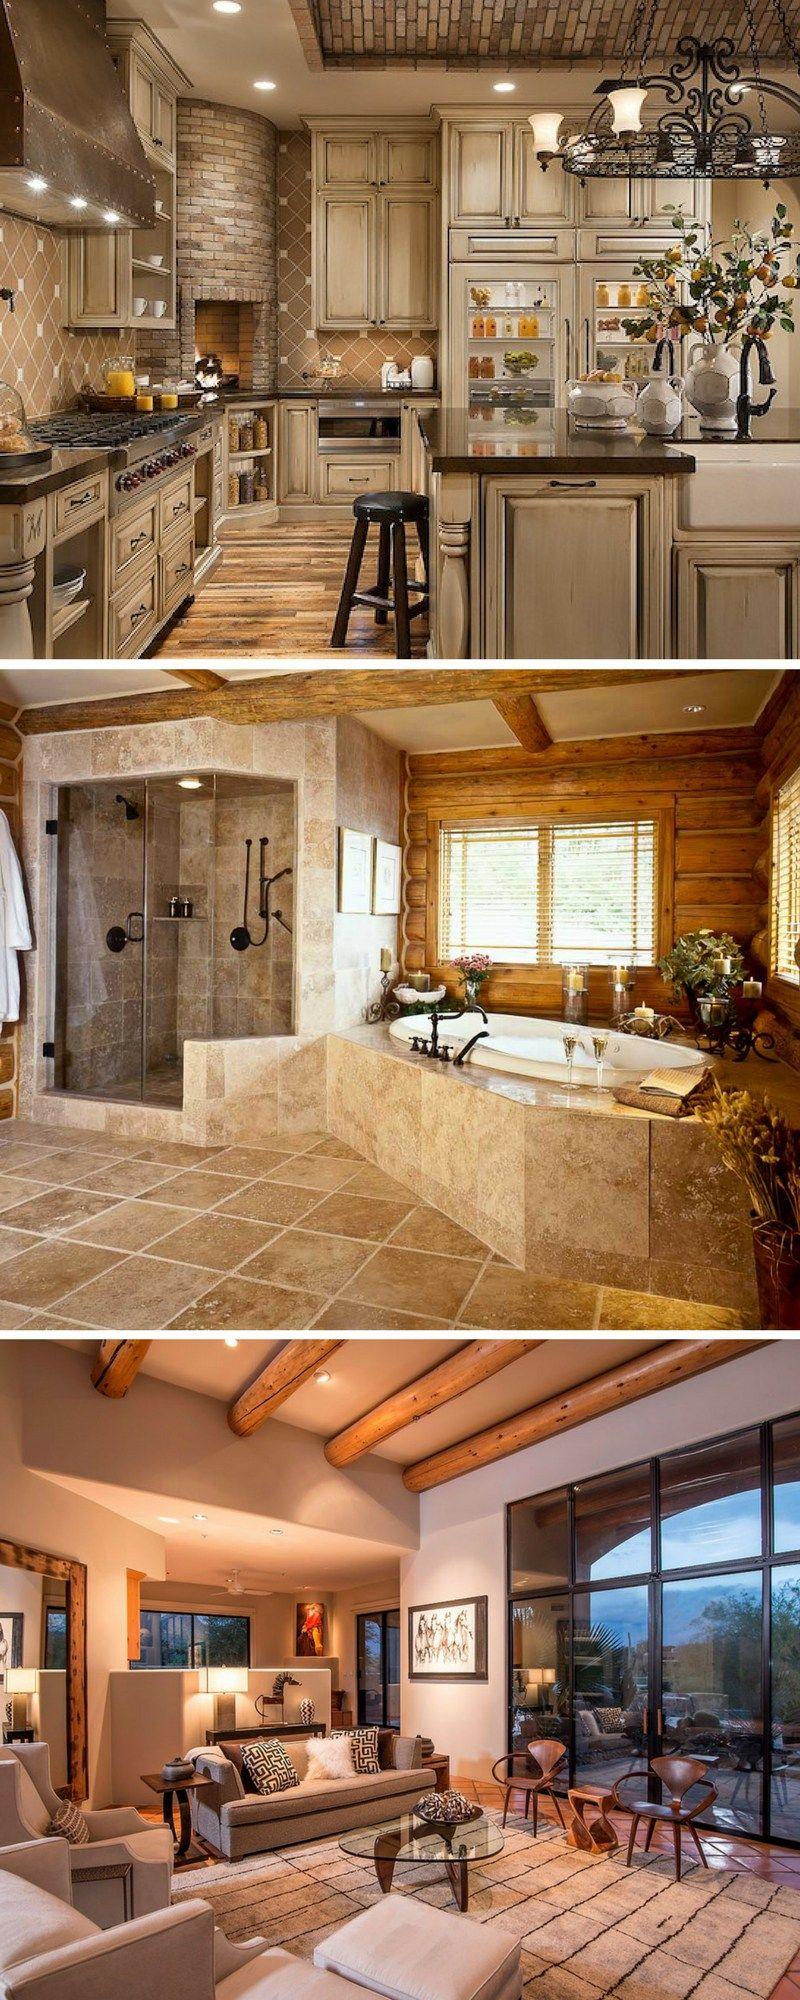 Southwestern Interior Design And Decor Western Interior Design